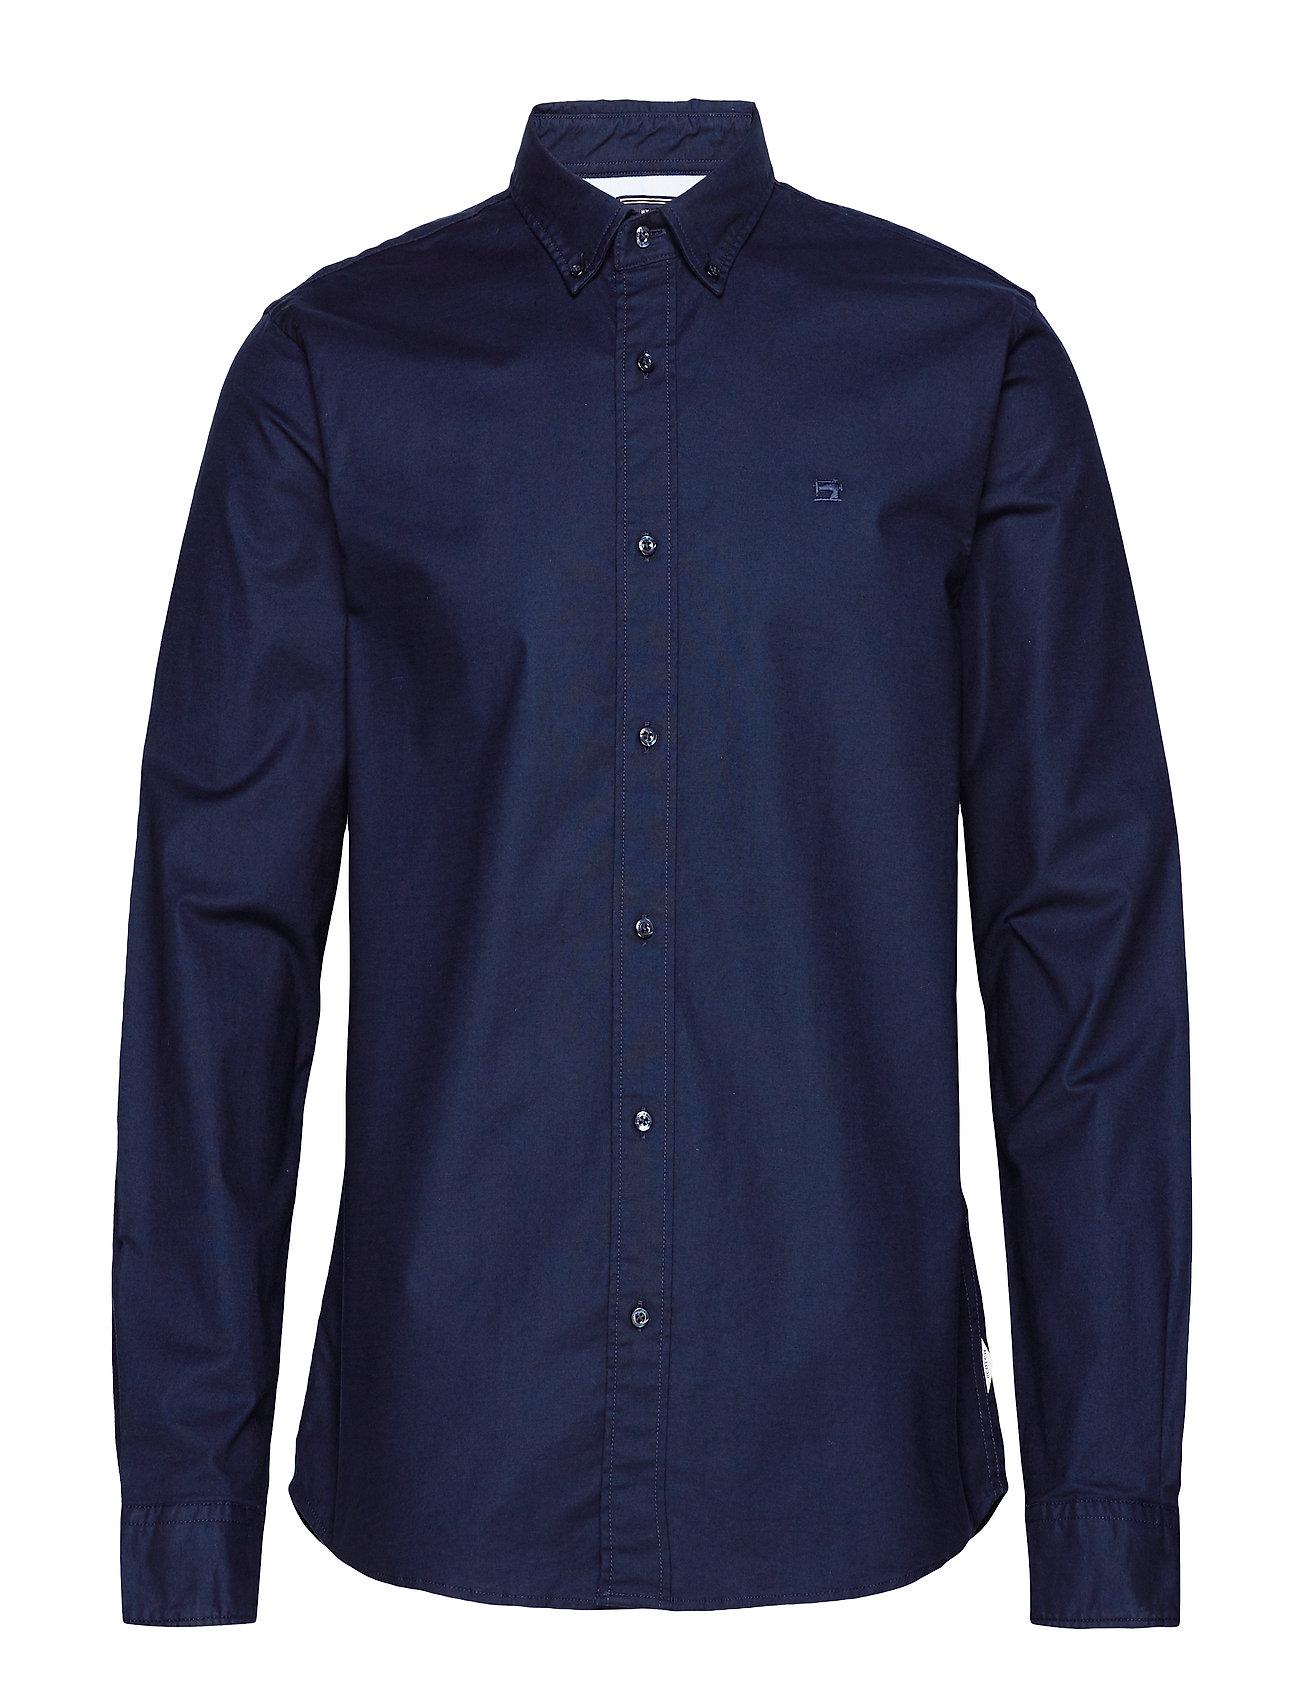 Scotch & Soda NOS Oxford shirt regular fit button down collar - NIGHT